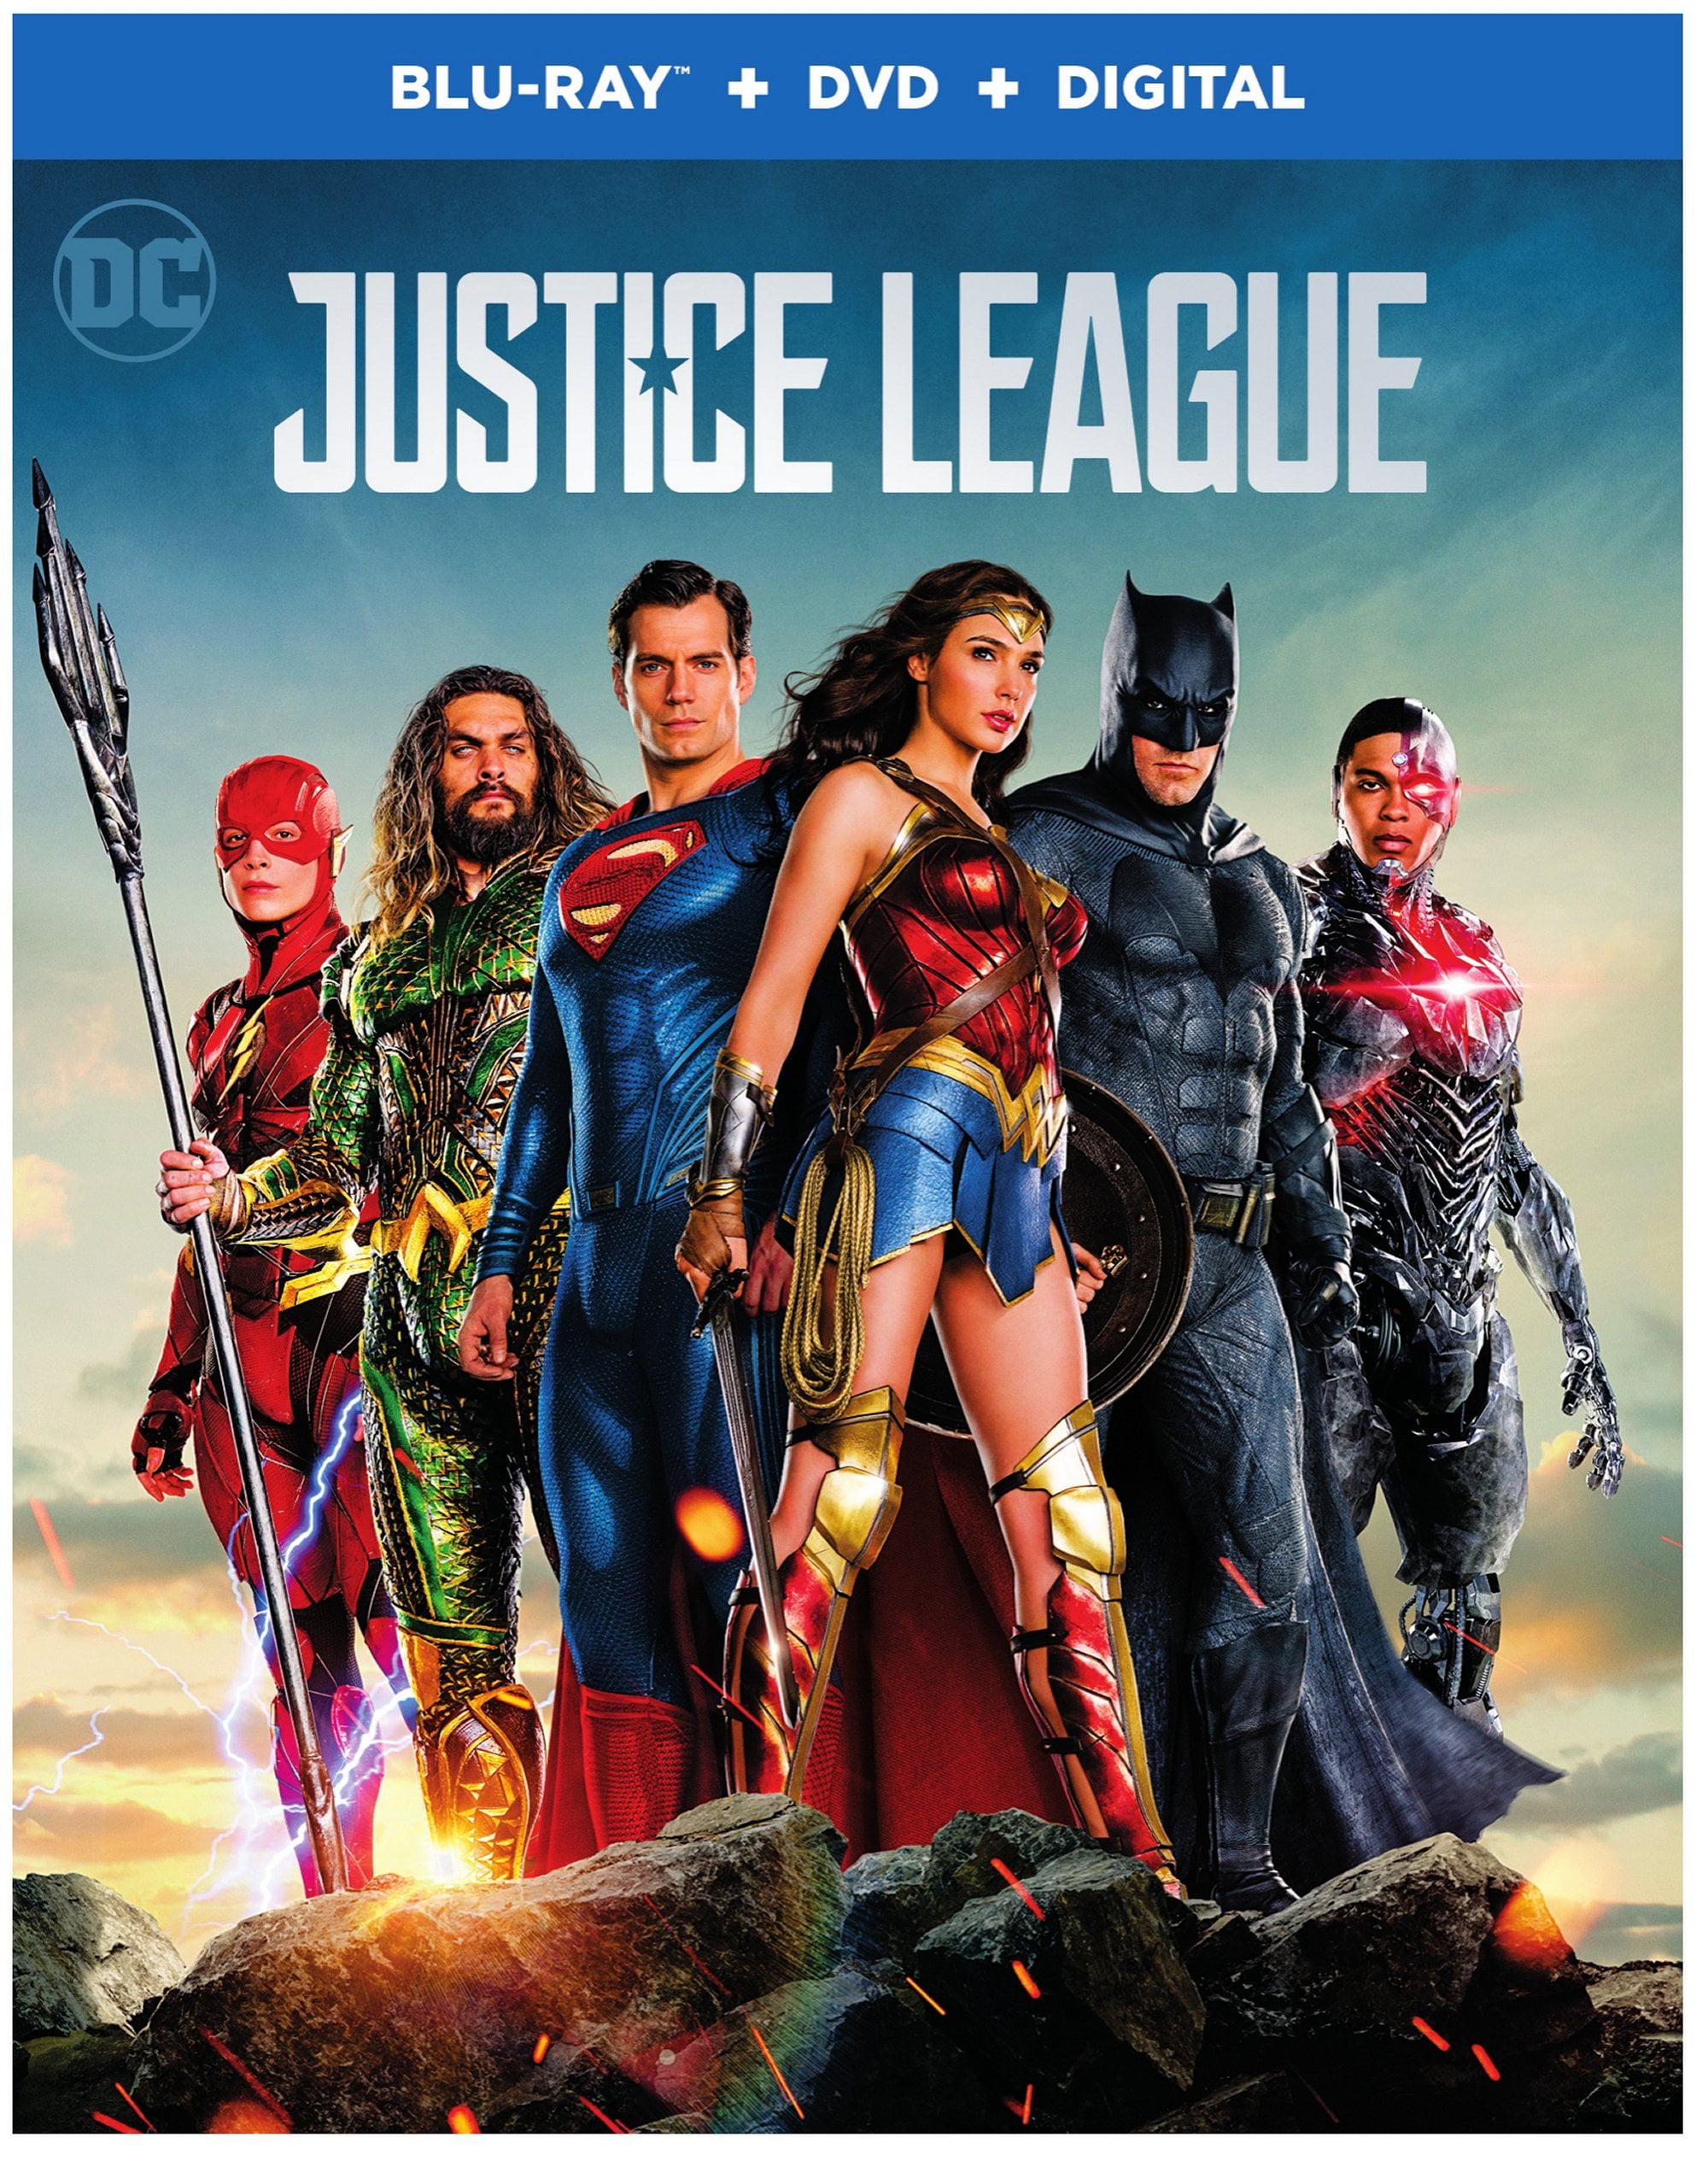 Justice League (2017) (Blu-ray + DVD + Digital) - Walmart.com